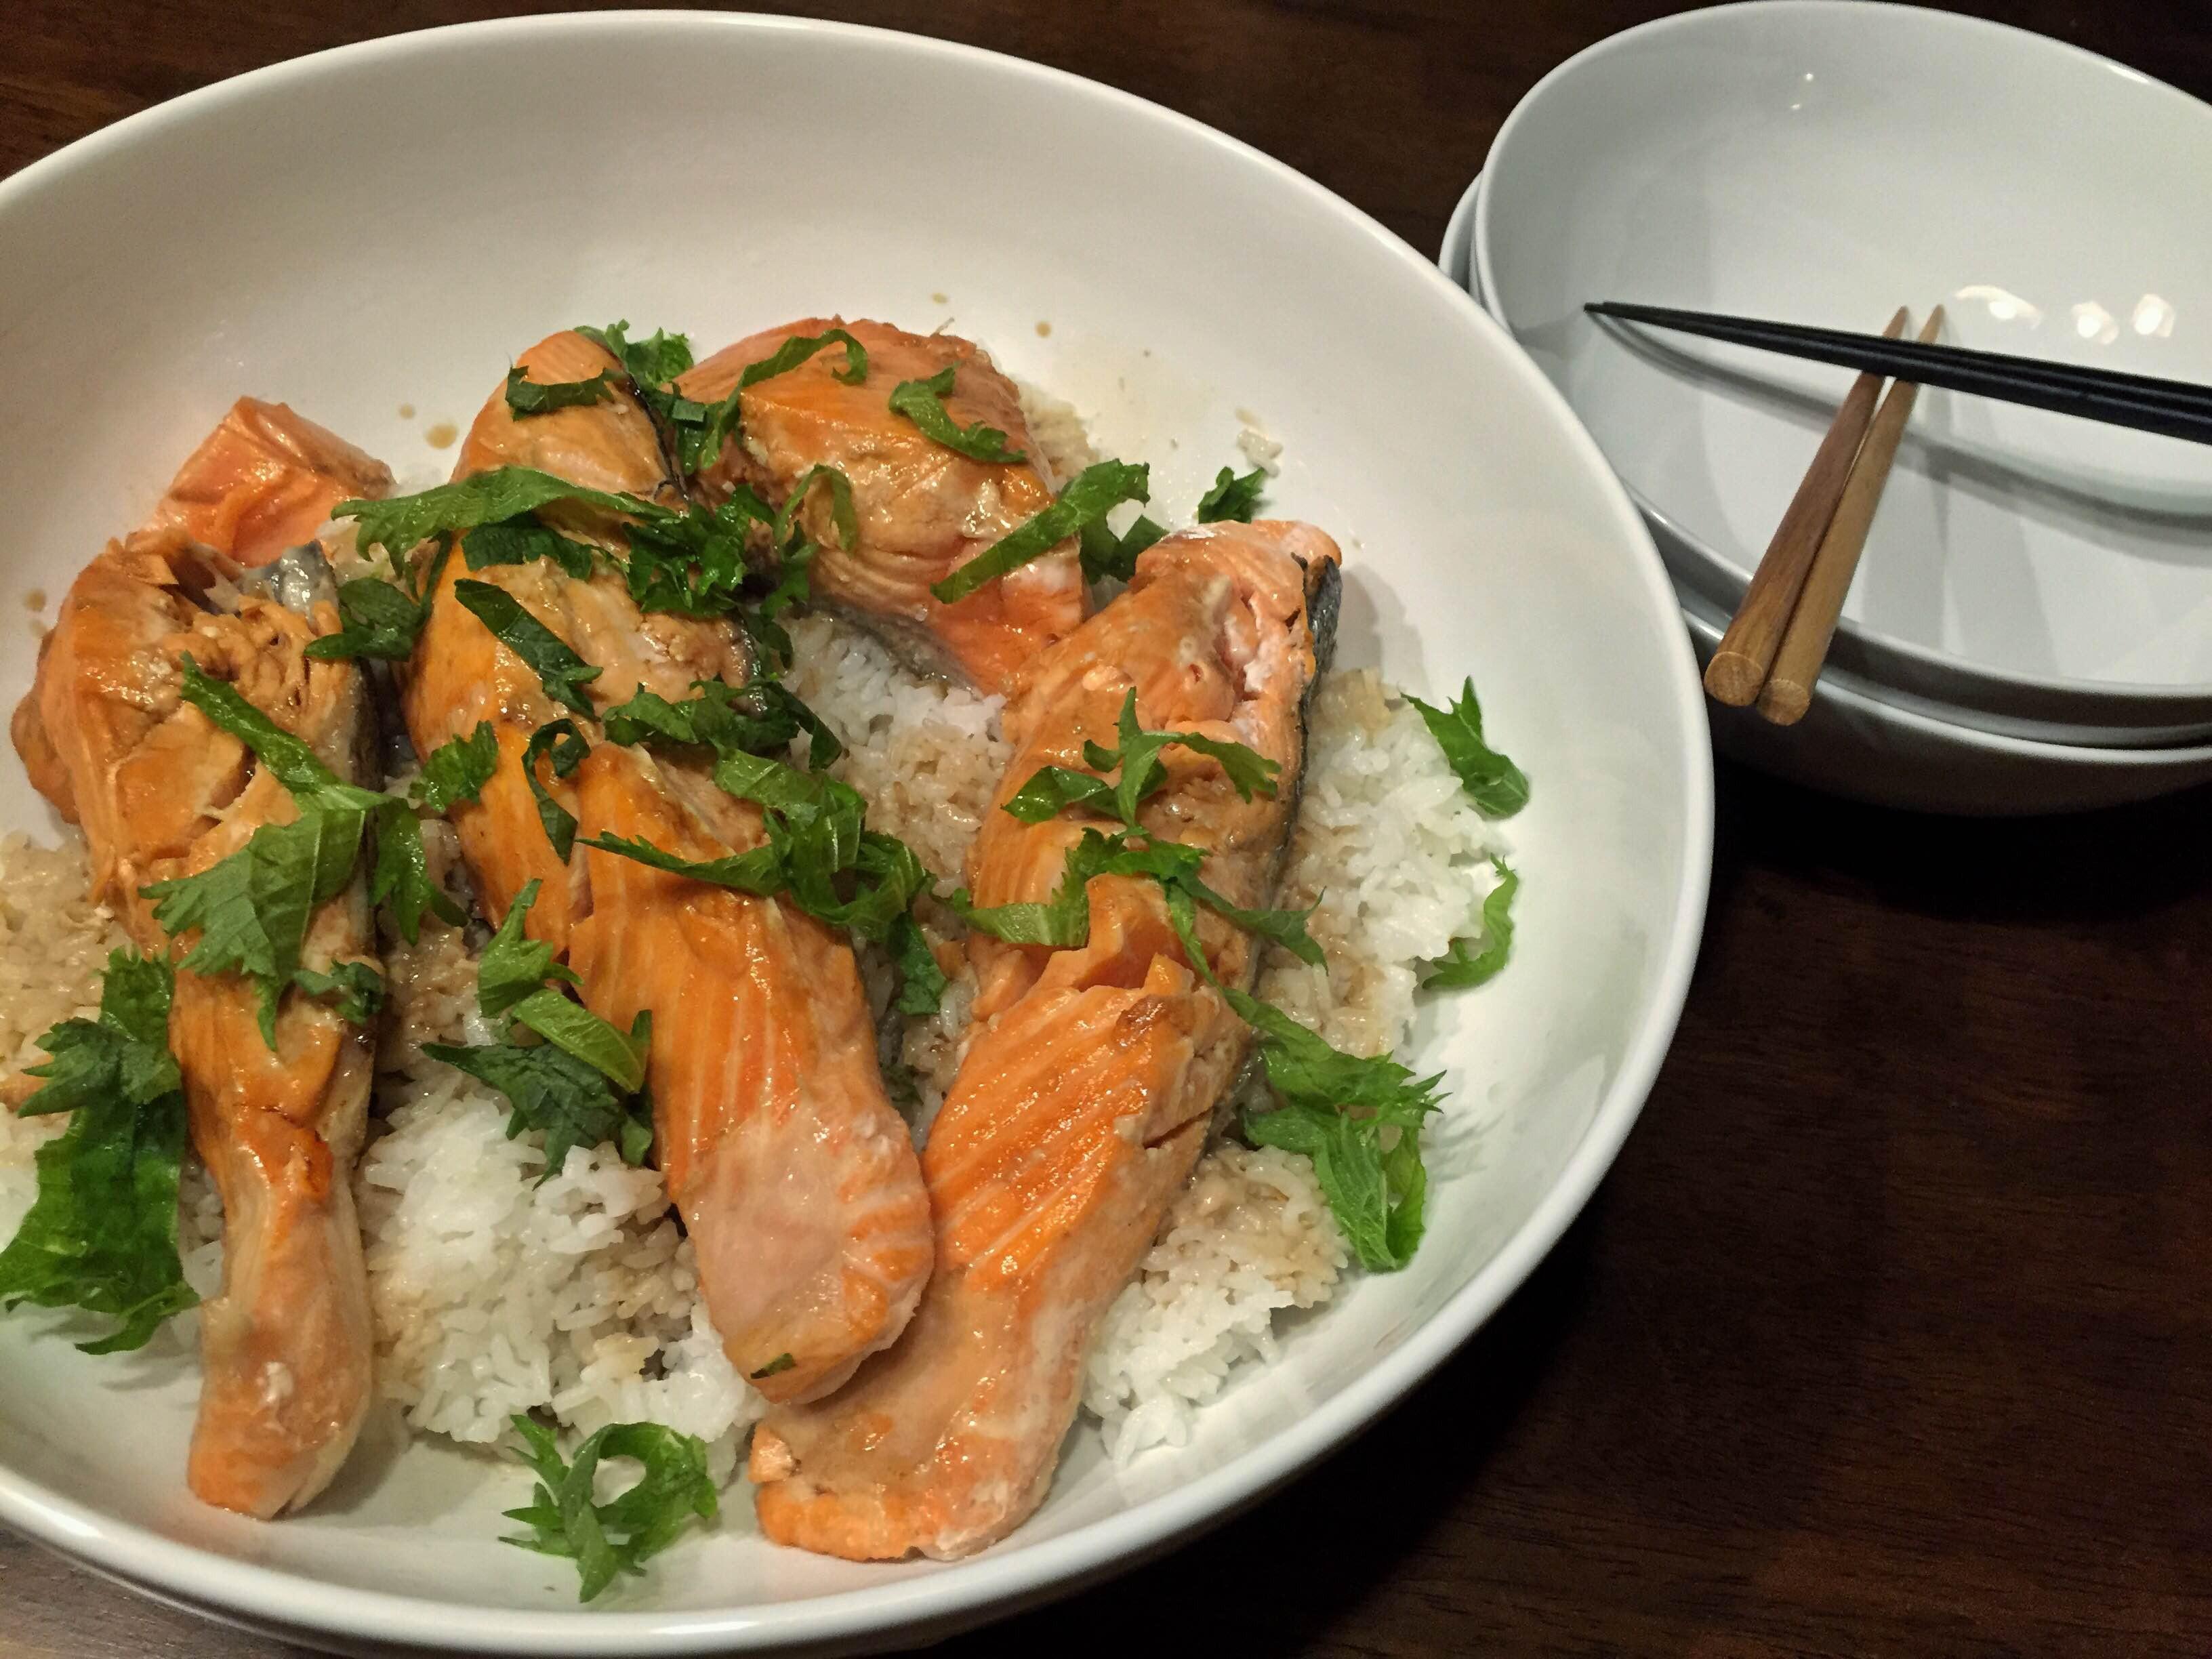 Healthy Kid Friendly Chicken Recipes  3 Healthy Kid Friendly Dinner Recipes Salmon Teriyaki